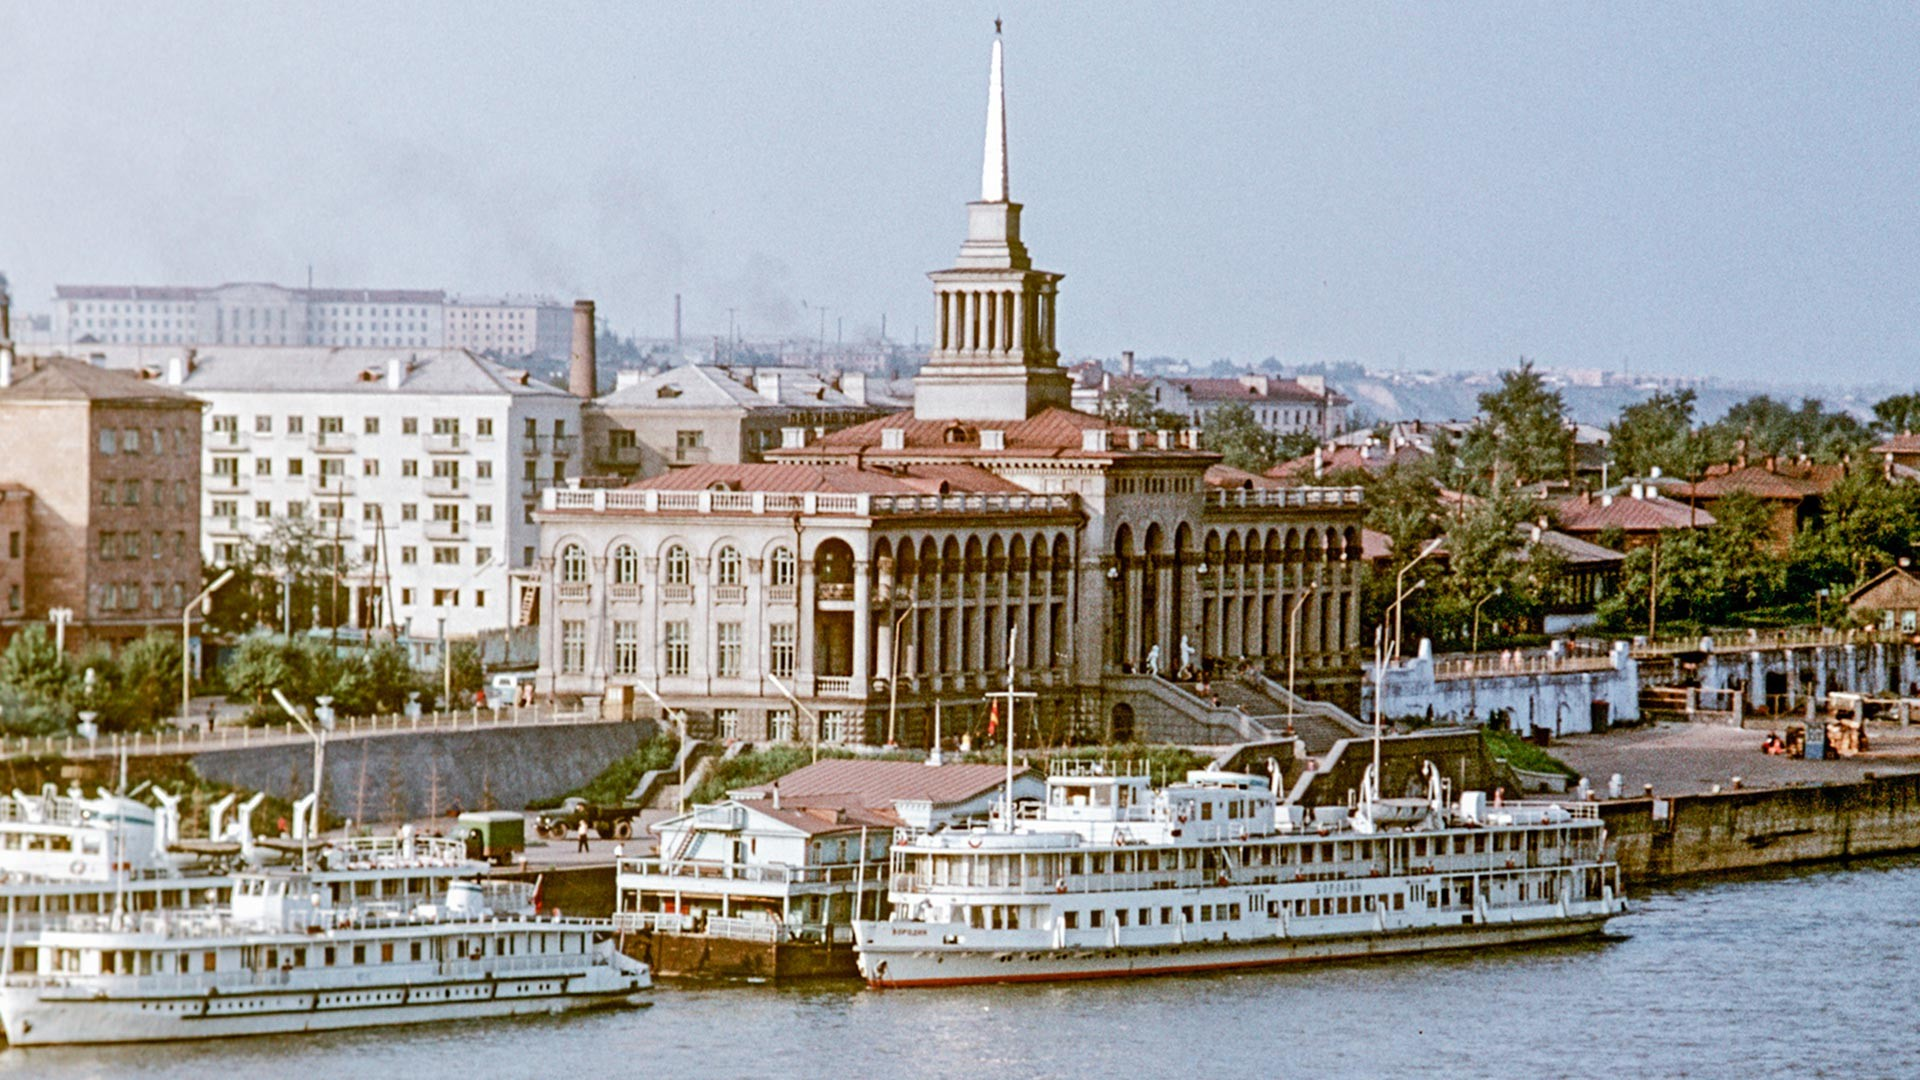 View of a river terminal in Krasnoyarsk, East Siberia, 1965.